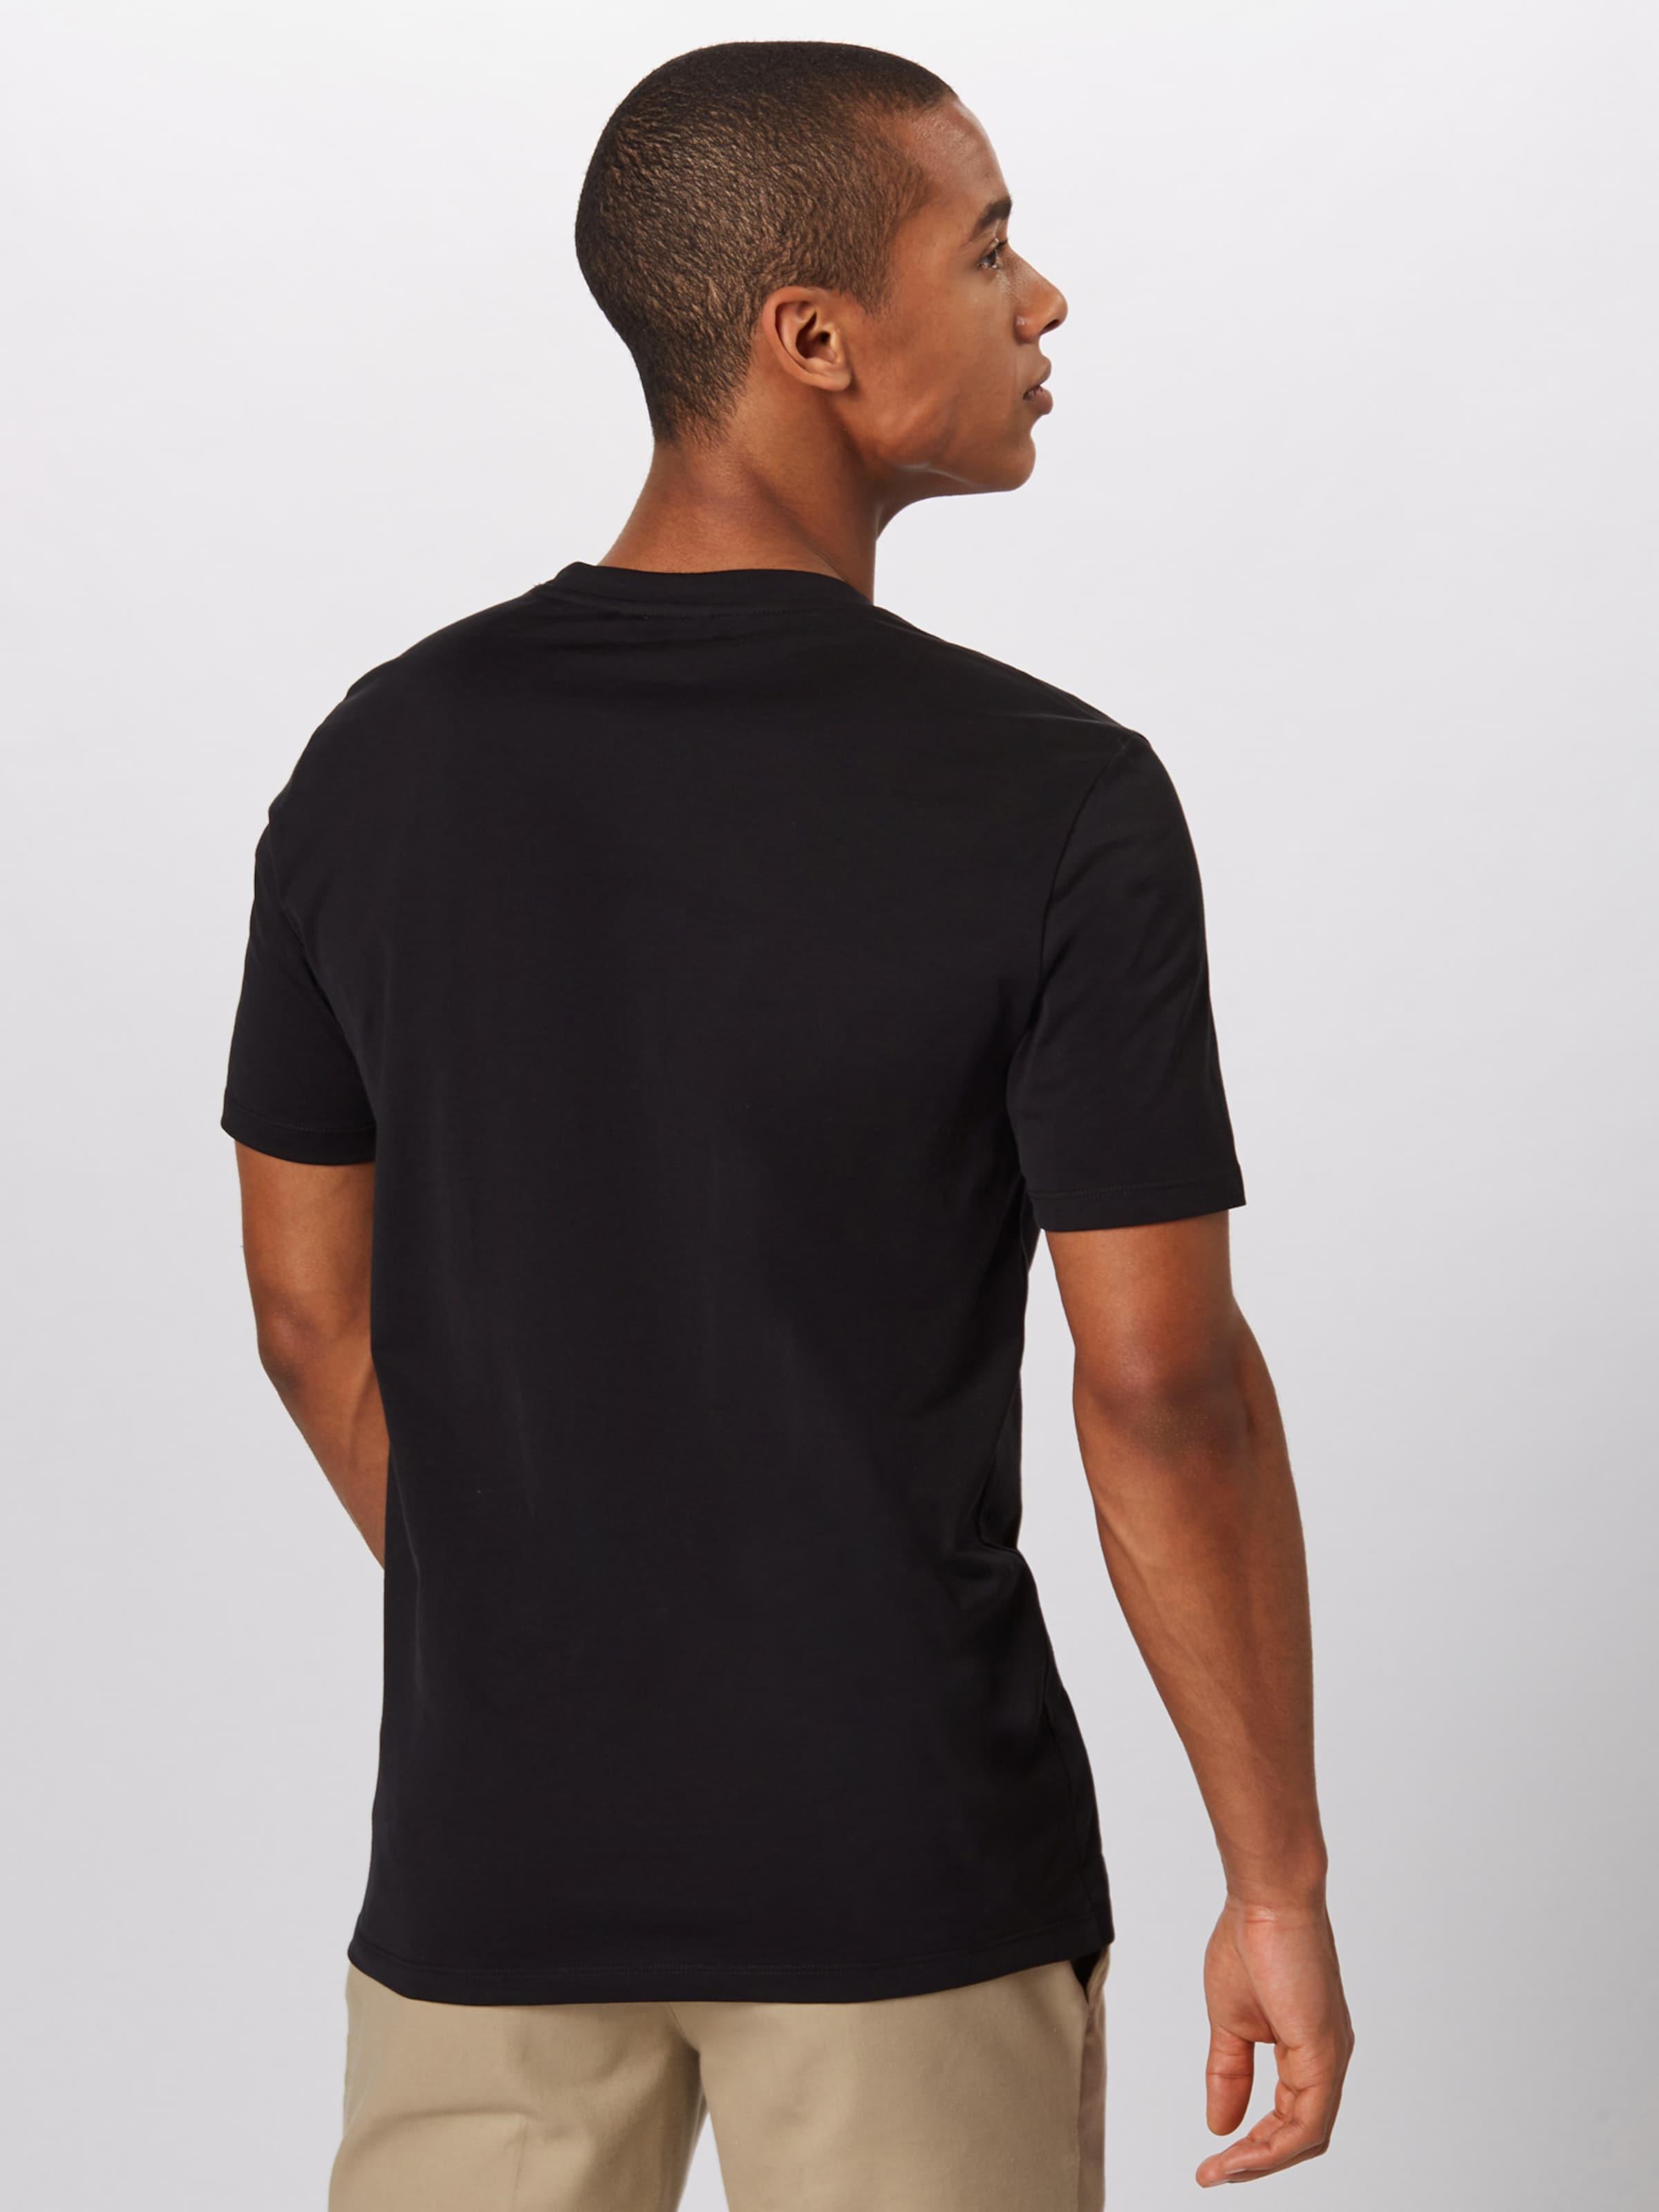 T 01' En shirt 10201206 Noir Hugo da 'durn193 OZiPTuXk